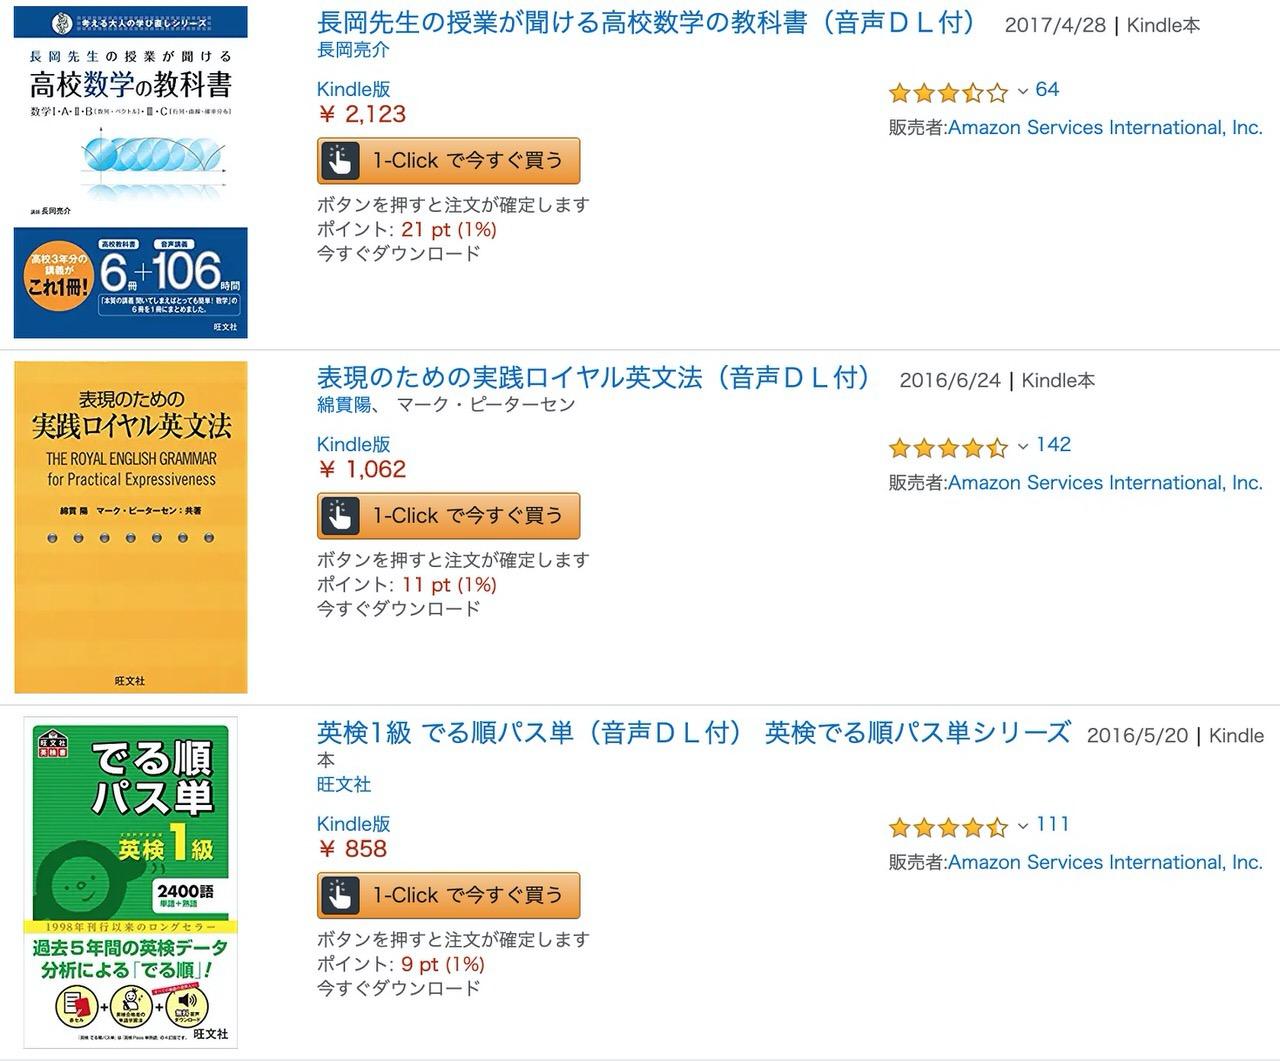 【Kindleセール】旺文社の約250冊が対象「春から始めよう!学習本・学習まんがフェア」開催中(4/16まで)